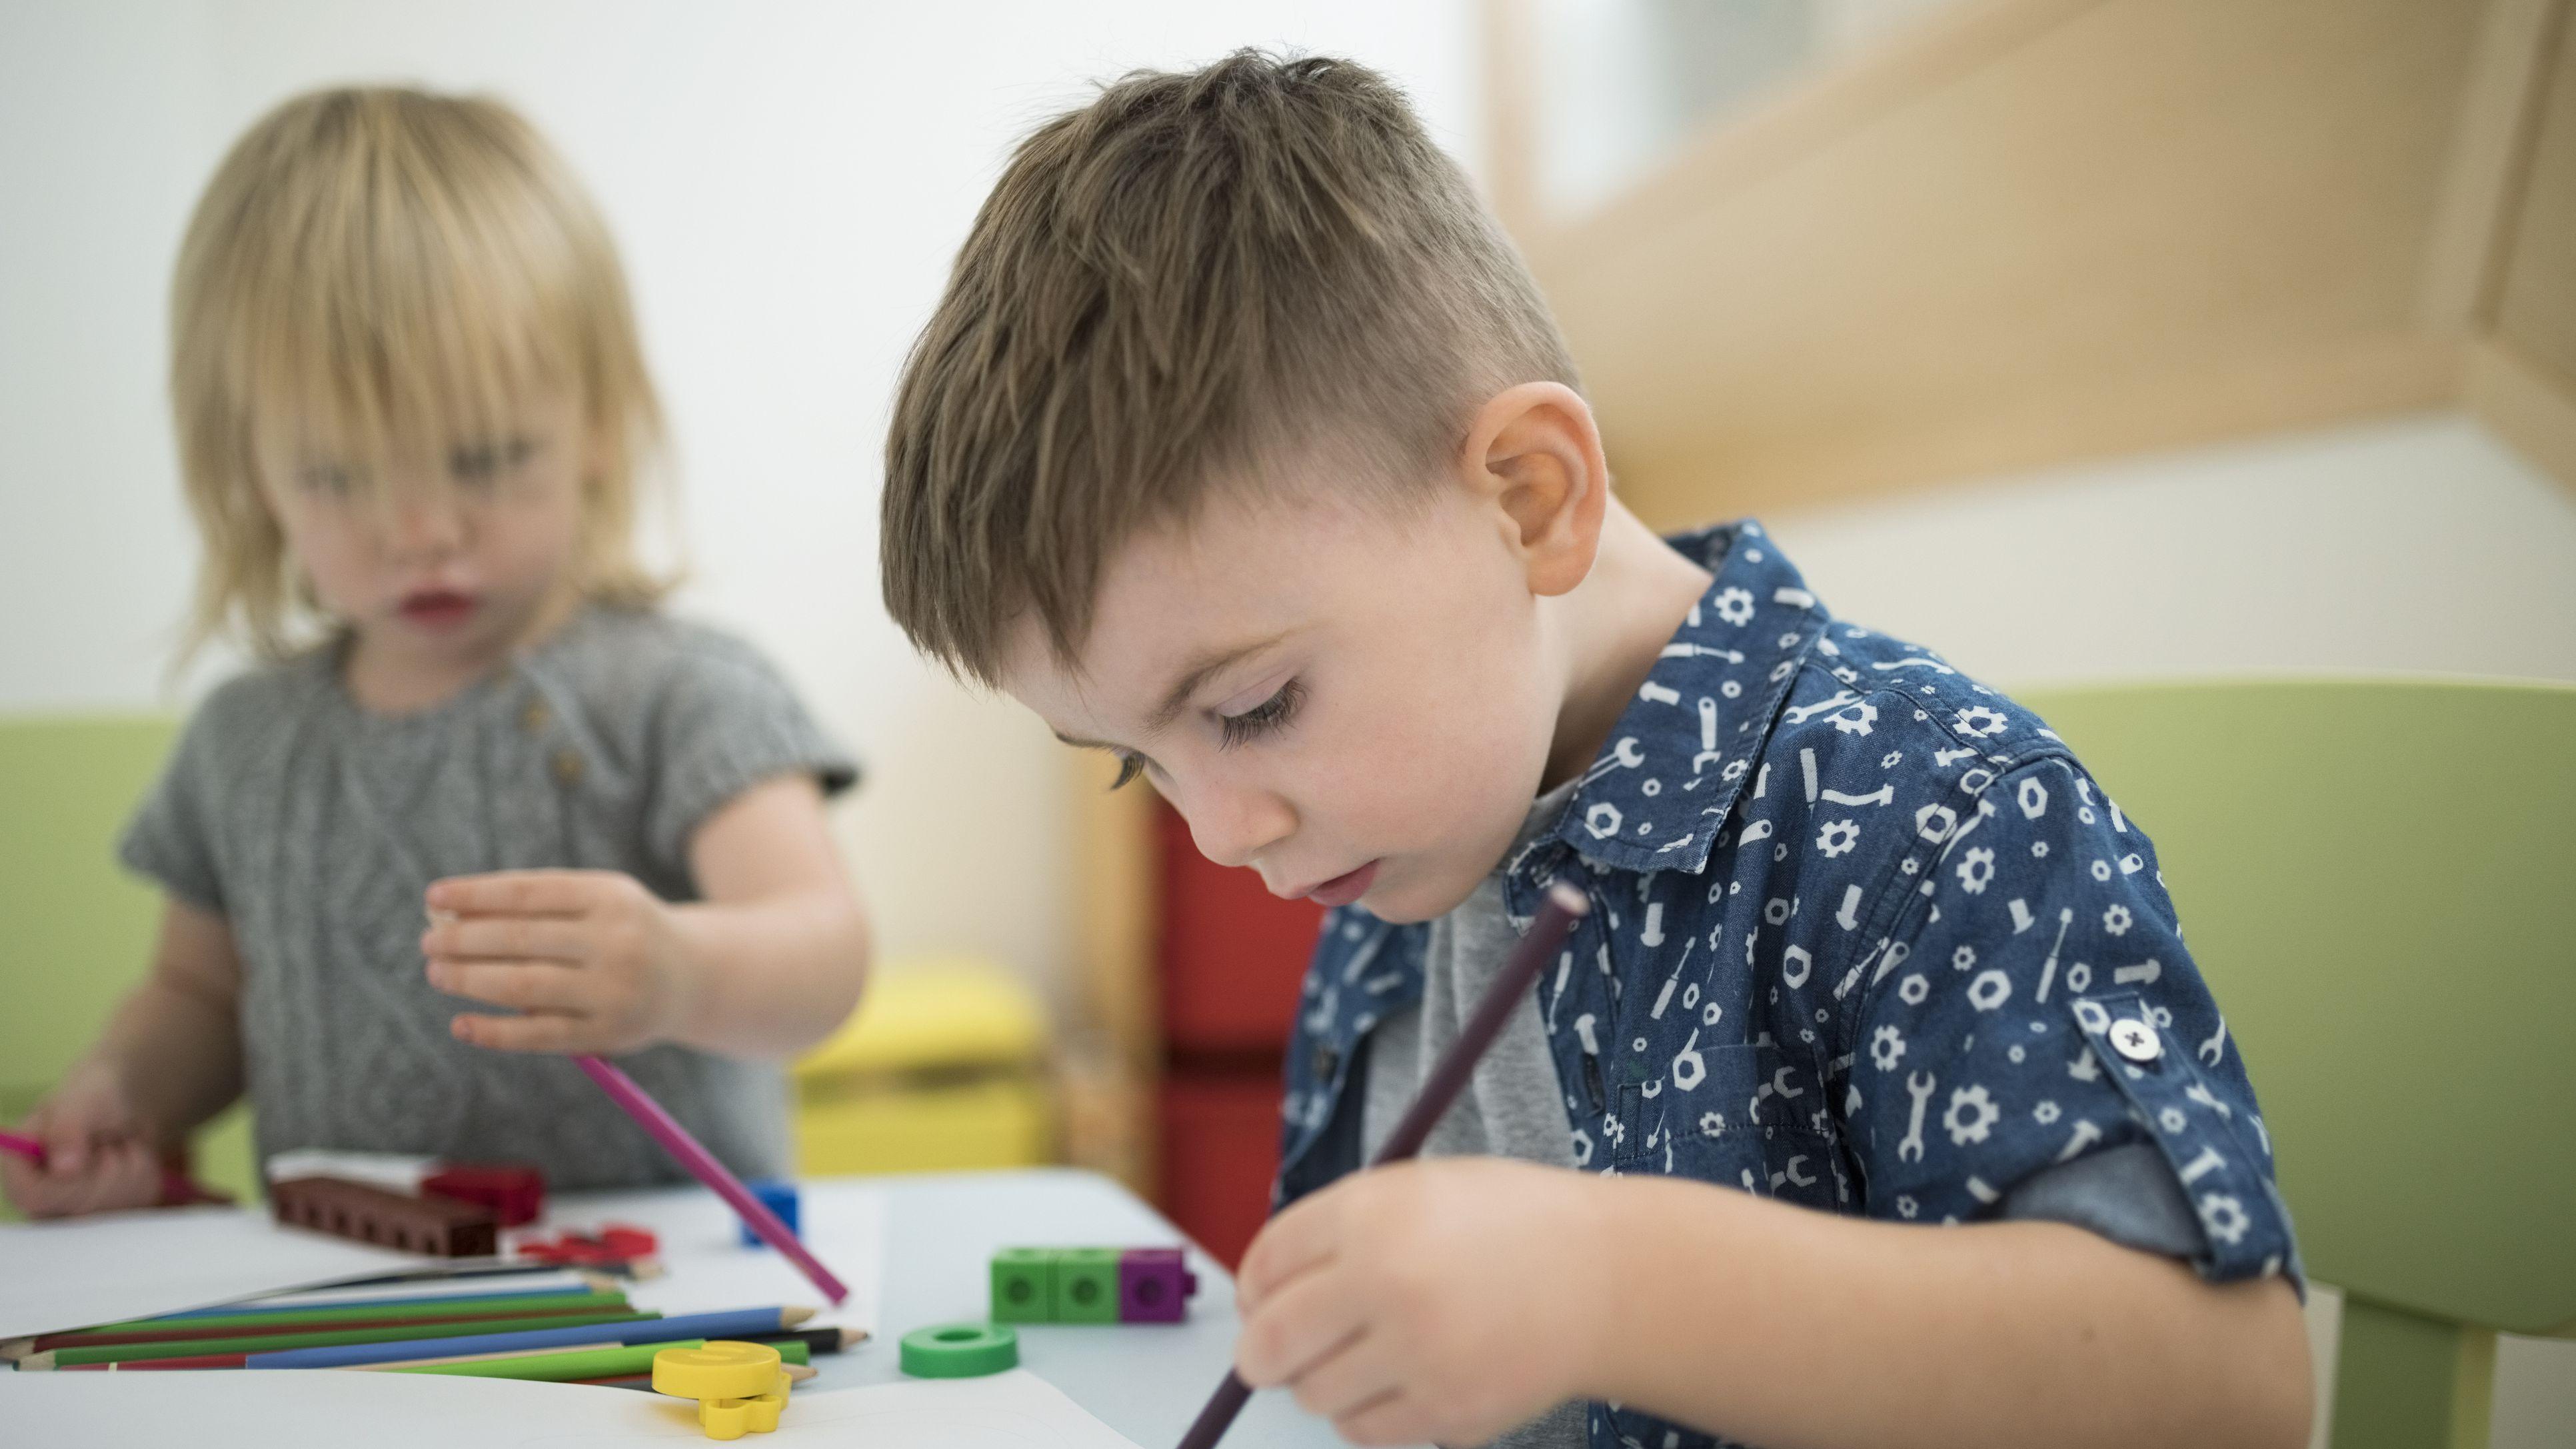 kids art classes singapore